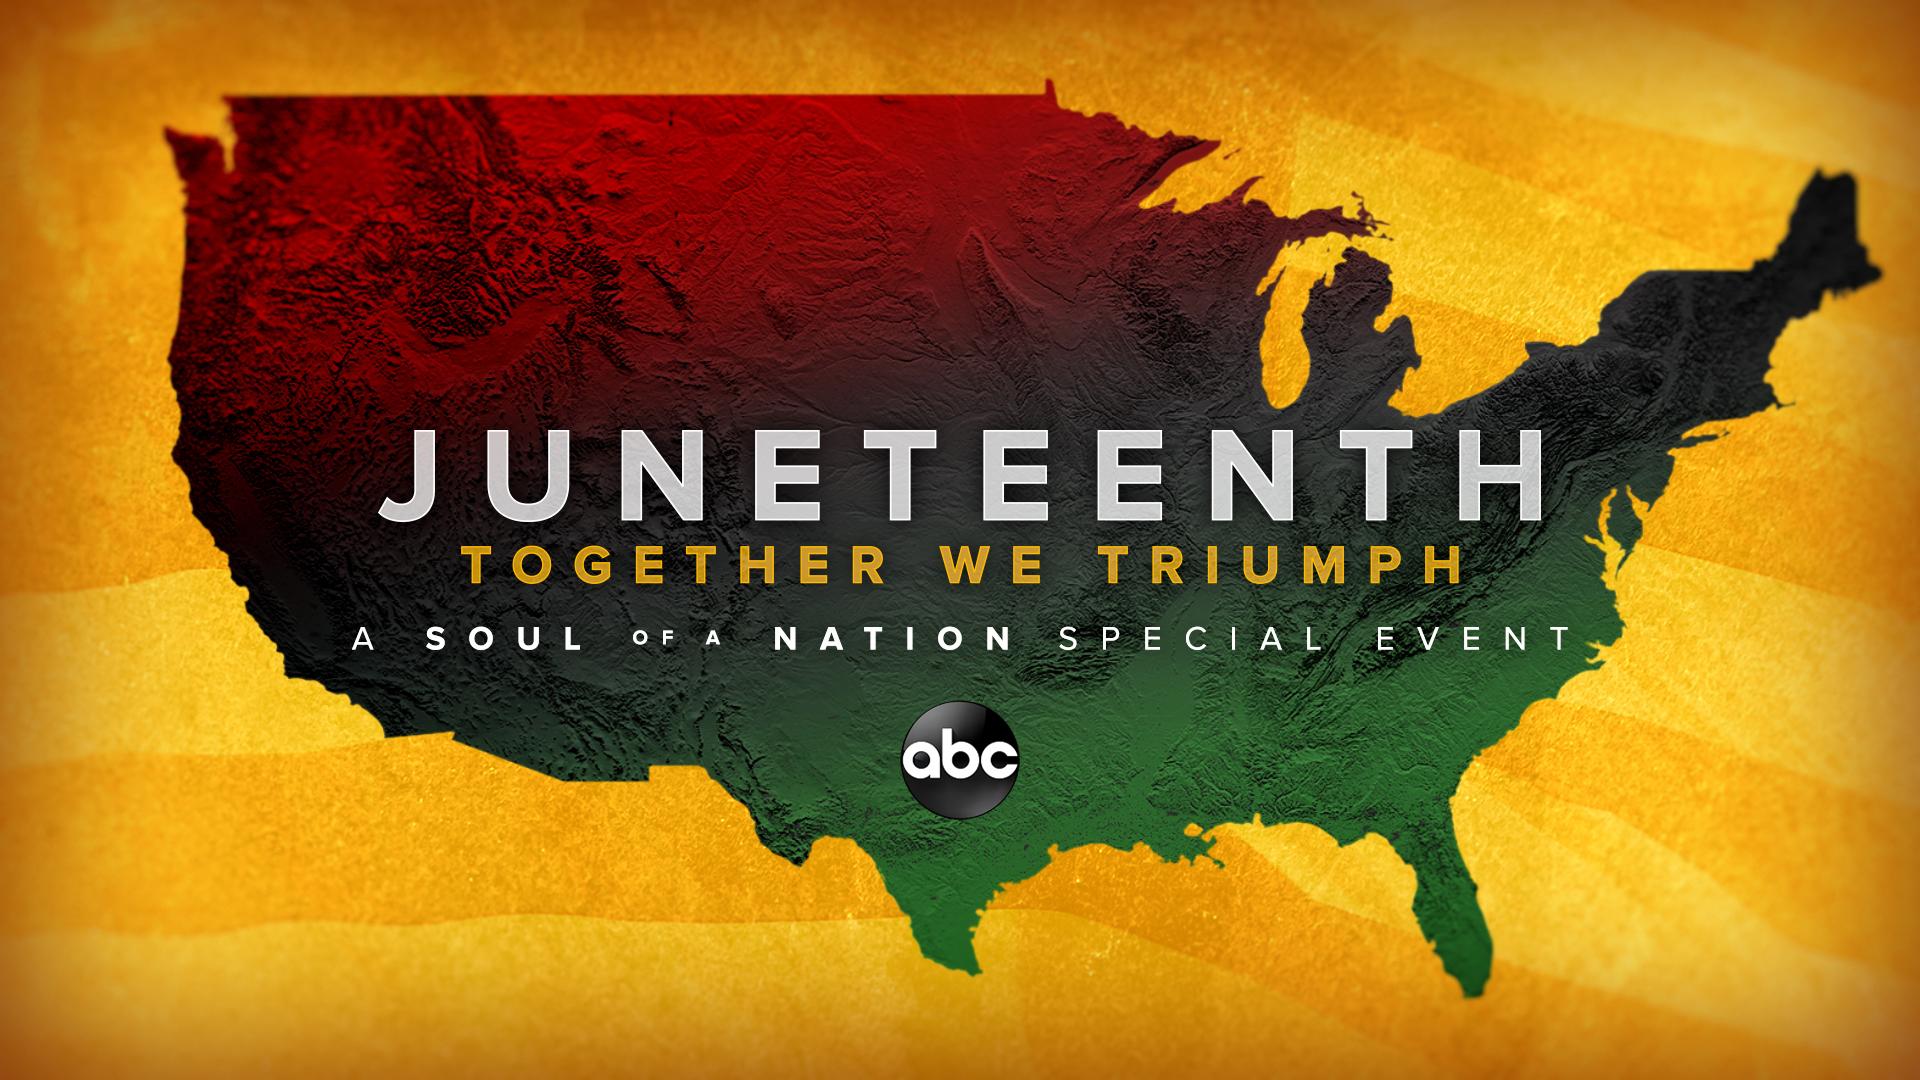 Juneteenth: Together We Triumph